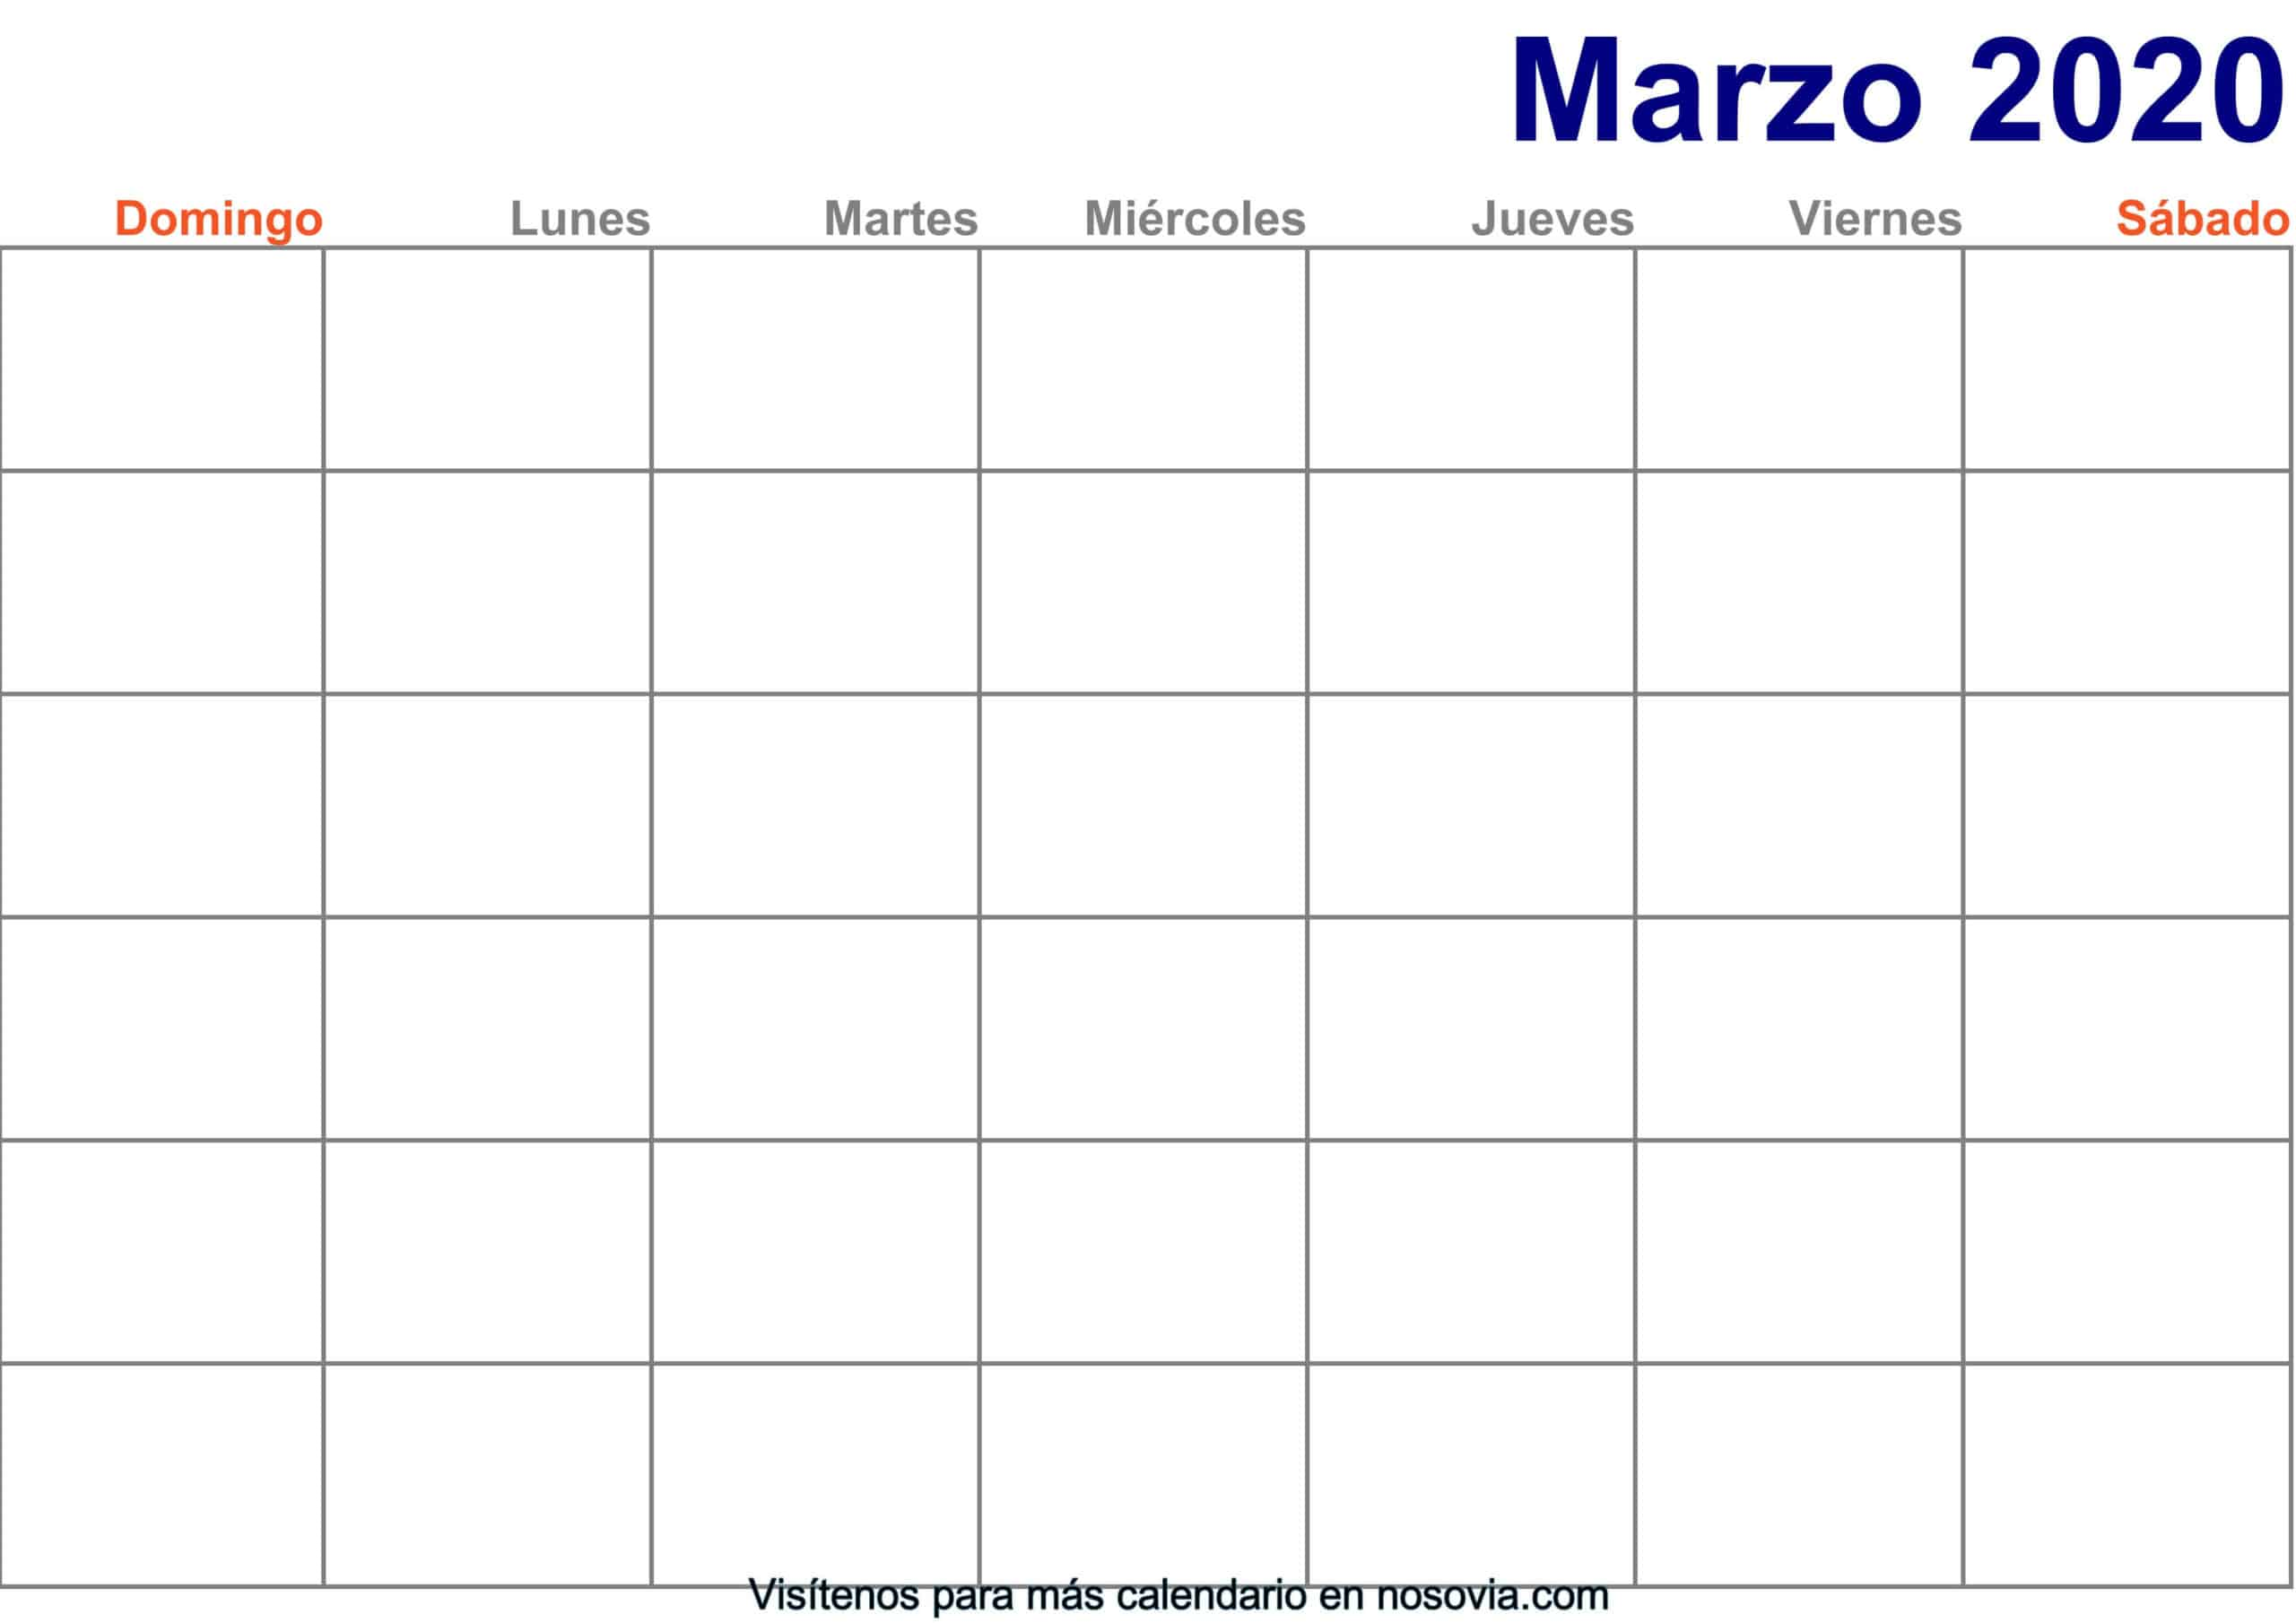 Calendario-marzo-2020-en-blanco-para-imprimir-gratis